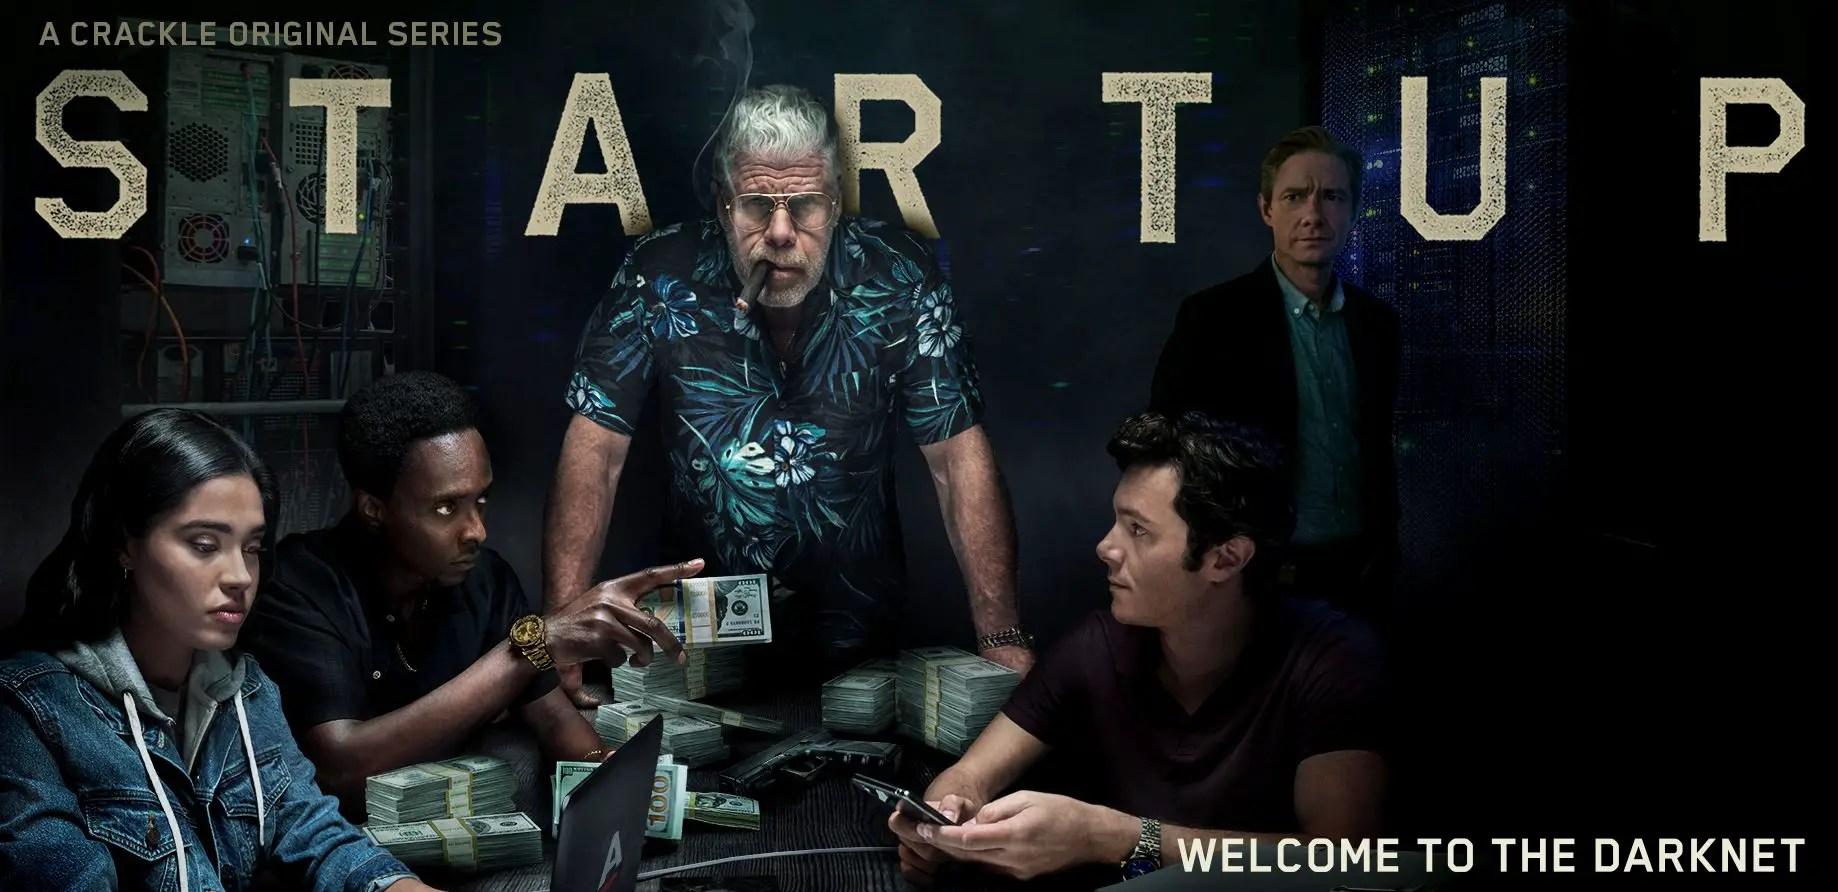 StartUp Season 3 Production Begins - Season 4 Next For Crackle TV ...